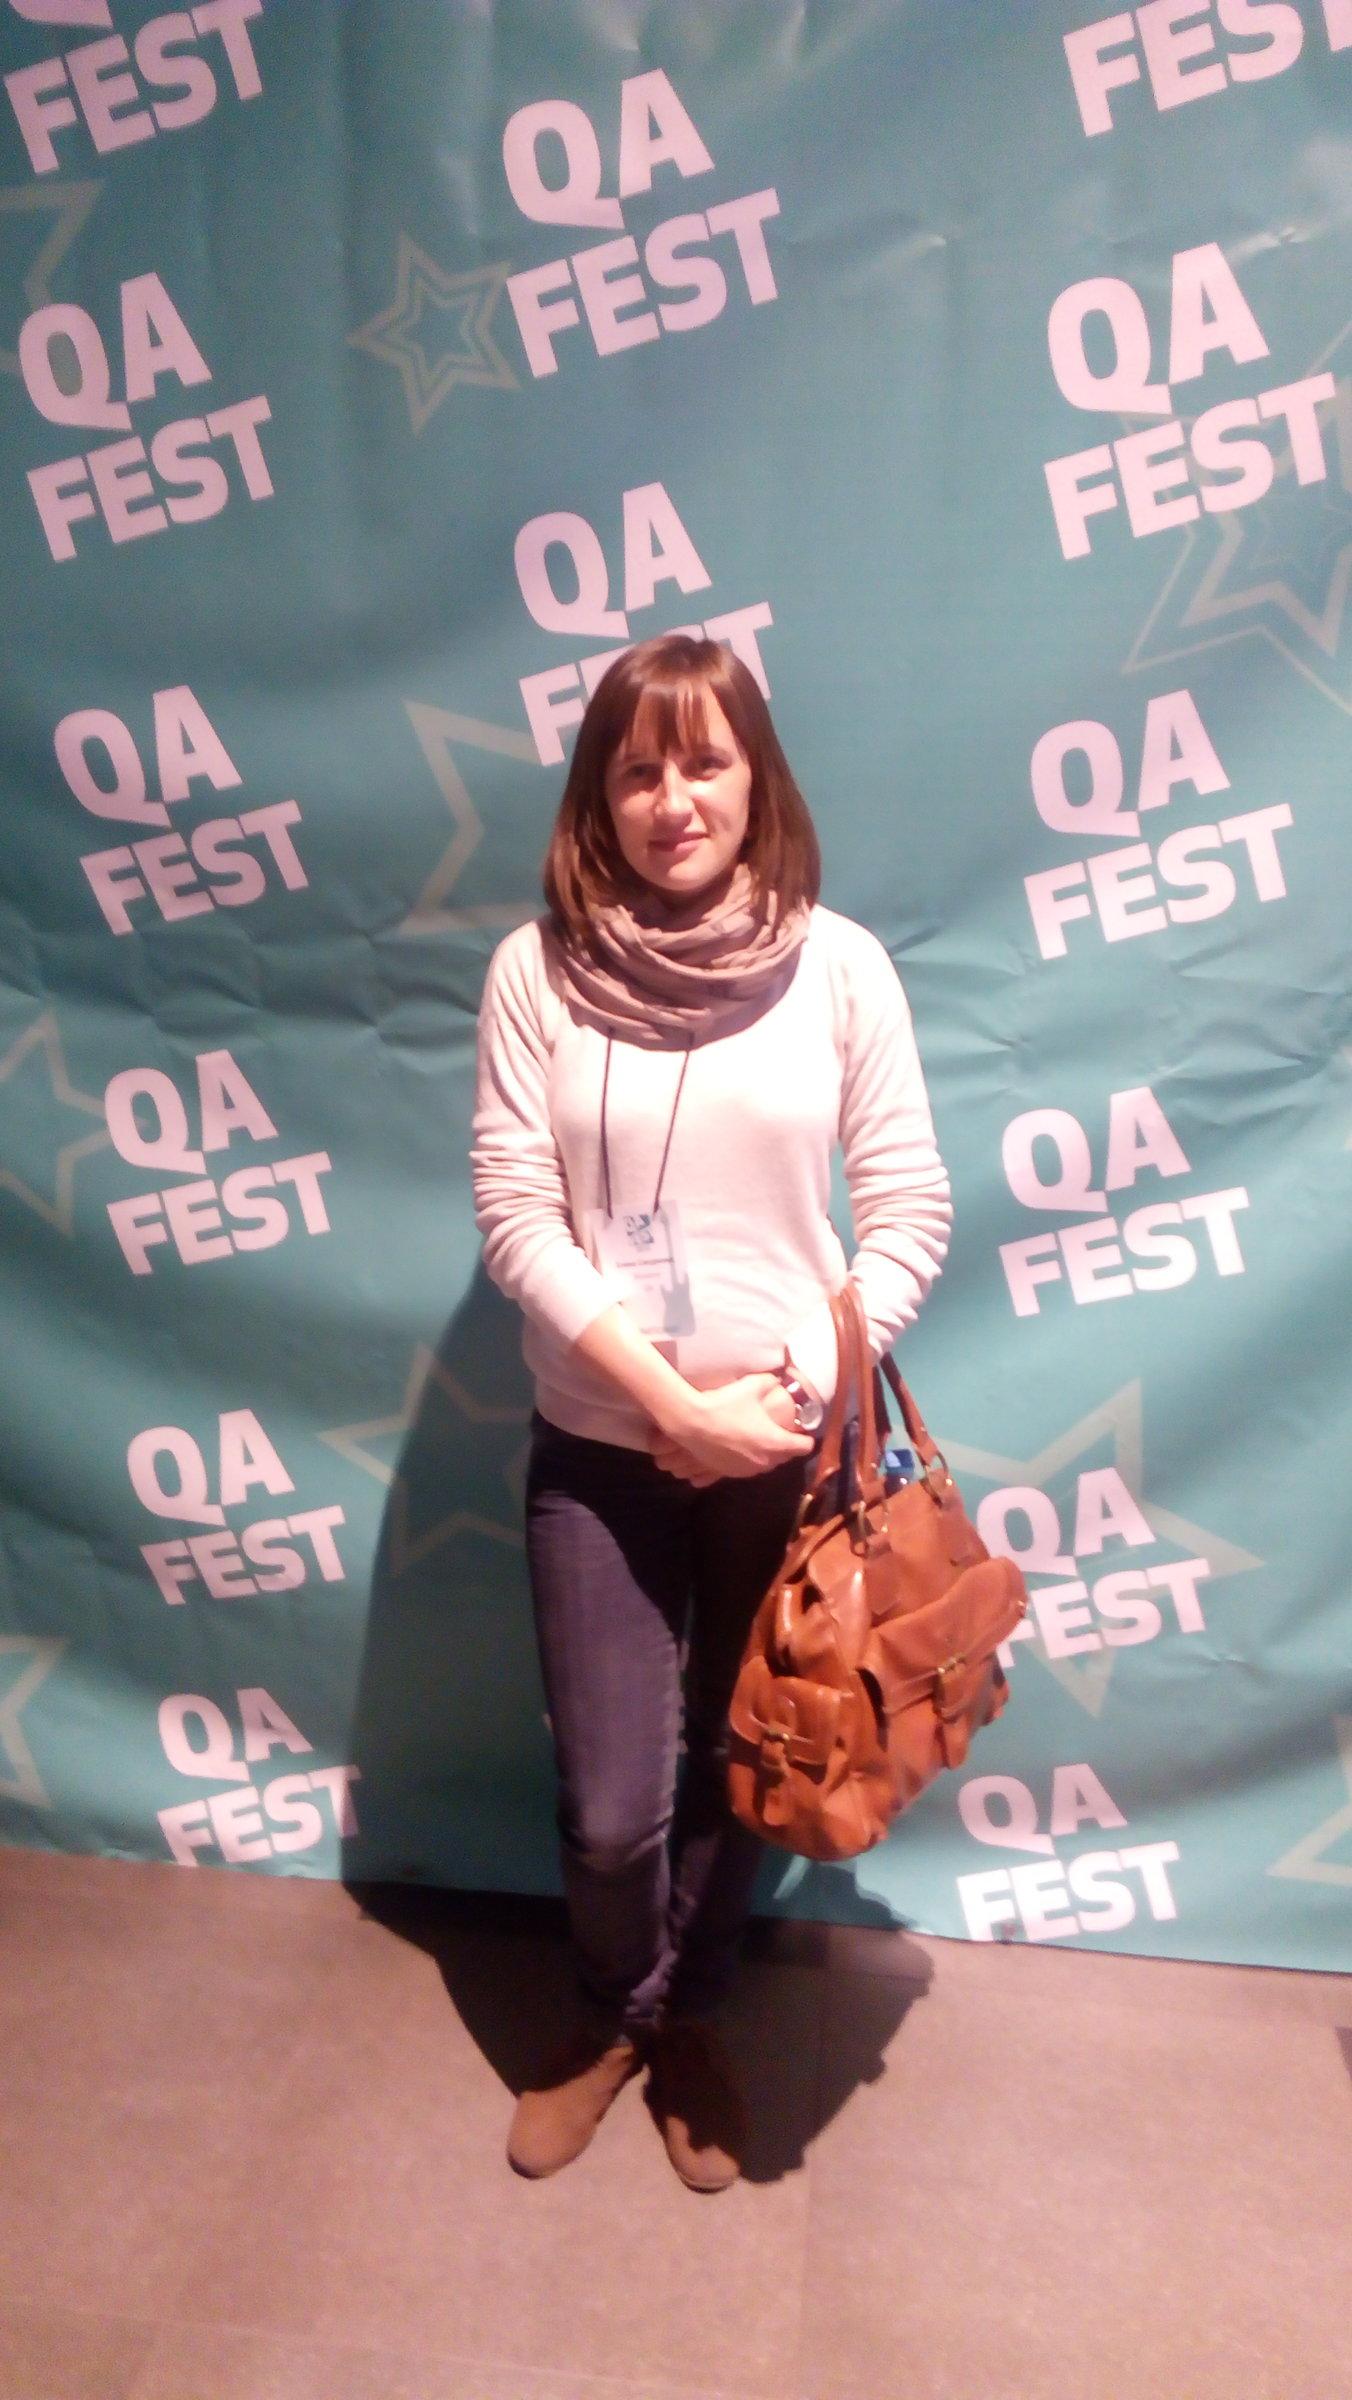 rsz blogqafest